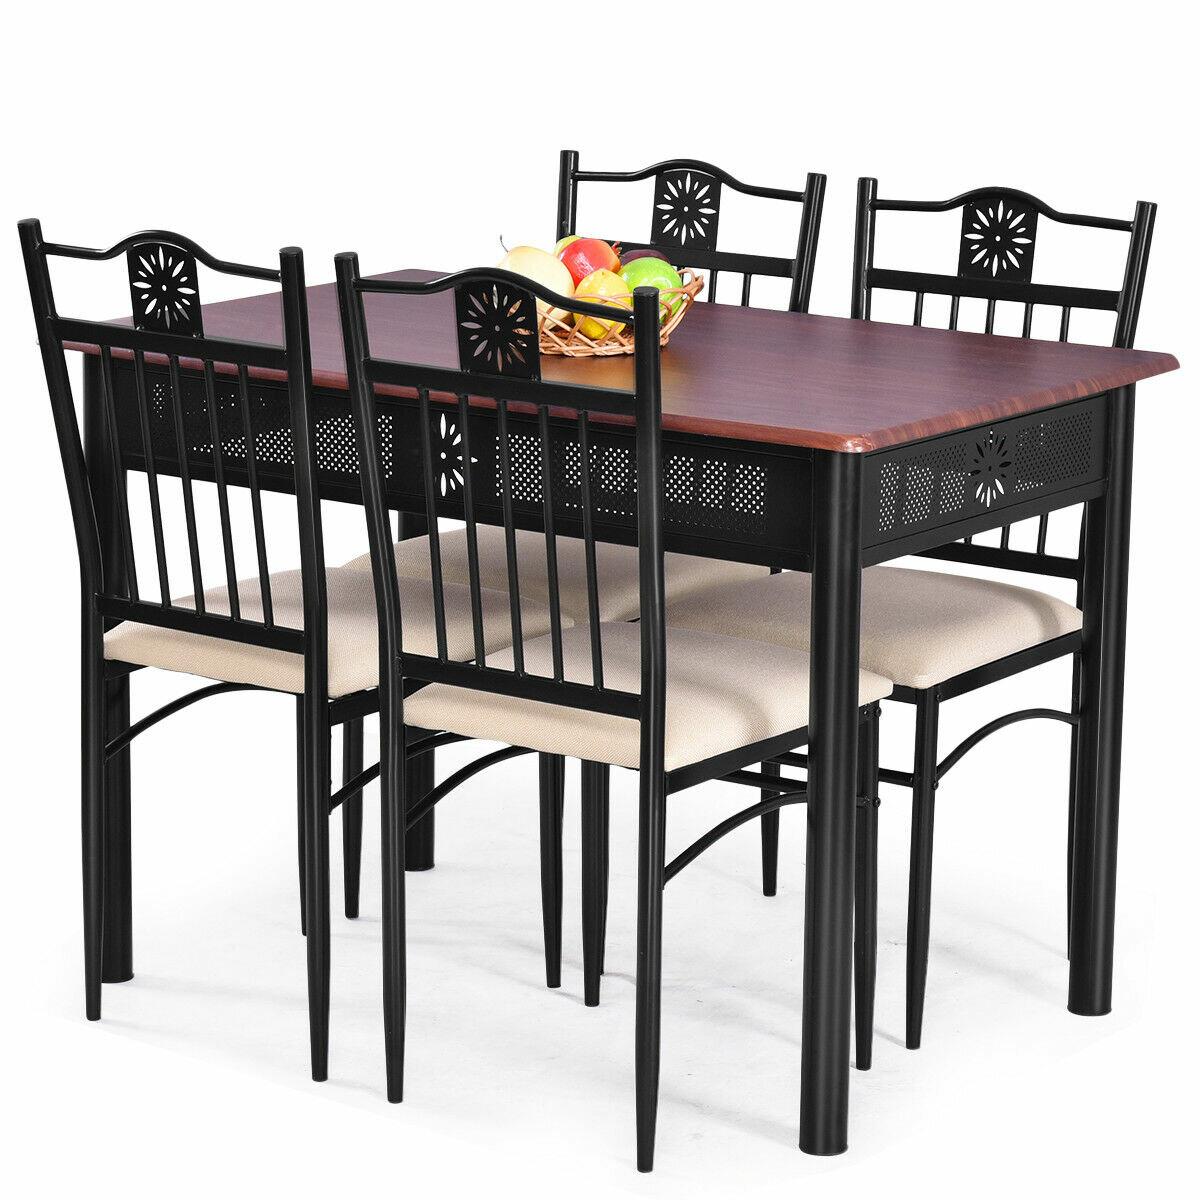 Ganya 5 Piece Dining Set Regarding Most Recent Stouferberg 5 Piece Dining Sets (View 11 of 20)